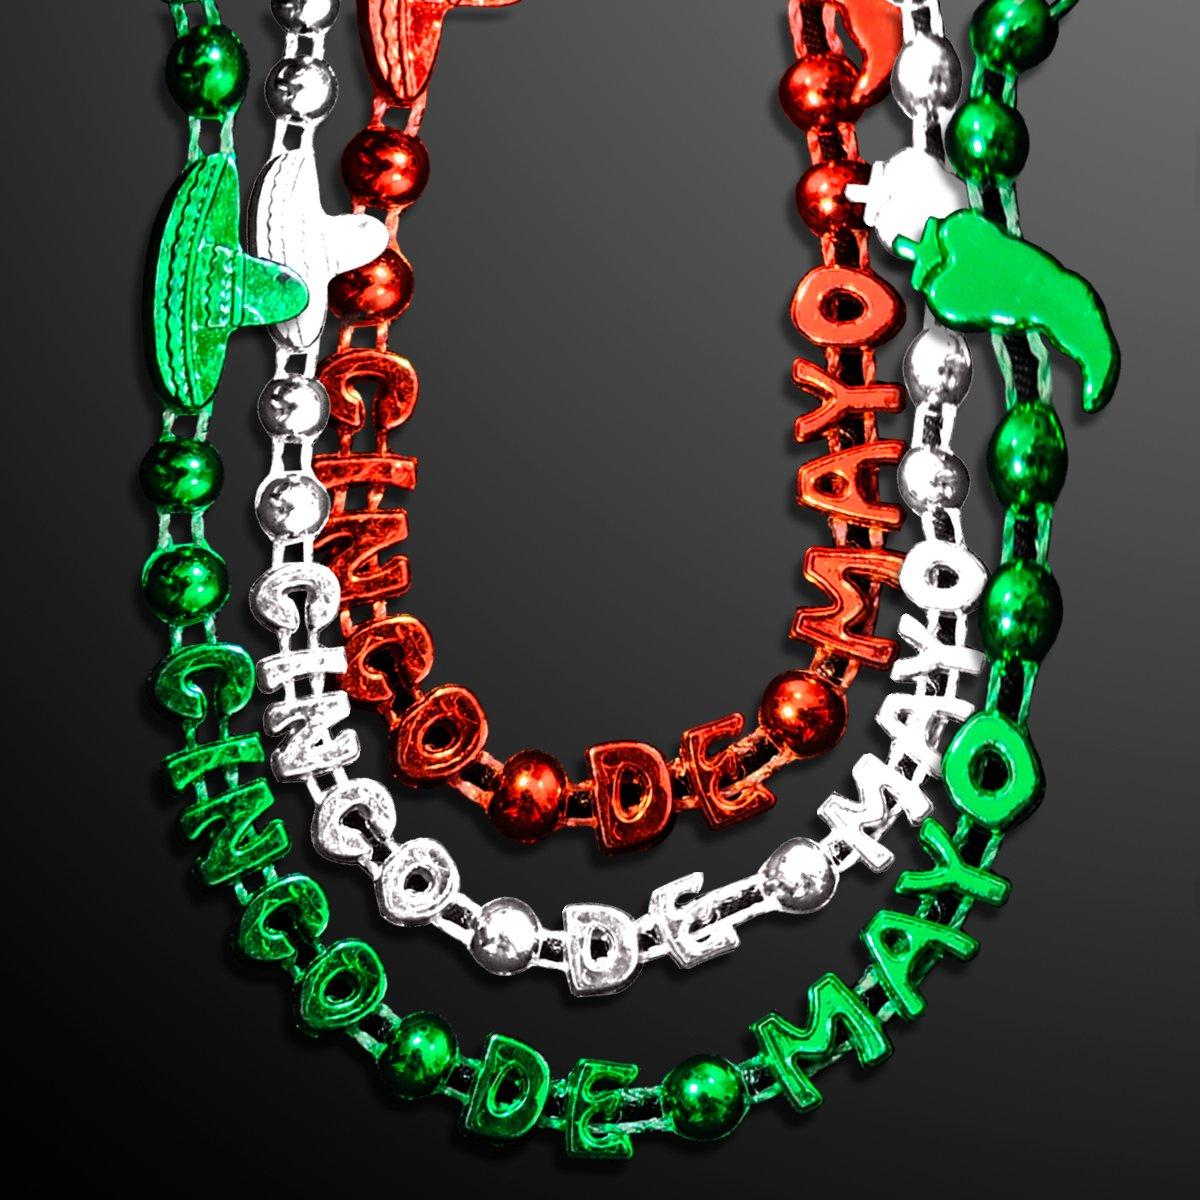 FlashingBlinkyLights Cinco de Mayo Party Bead Necklaces (Set of 72)